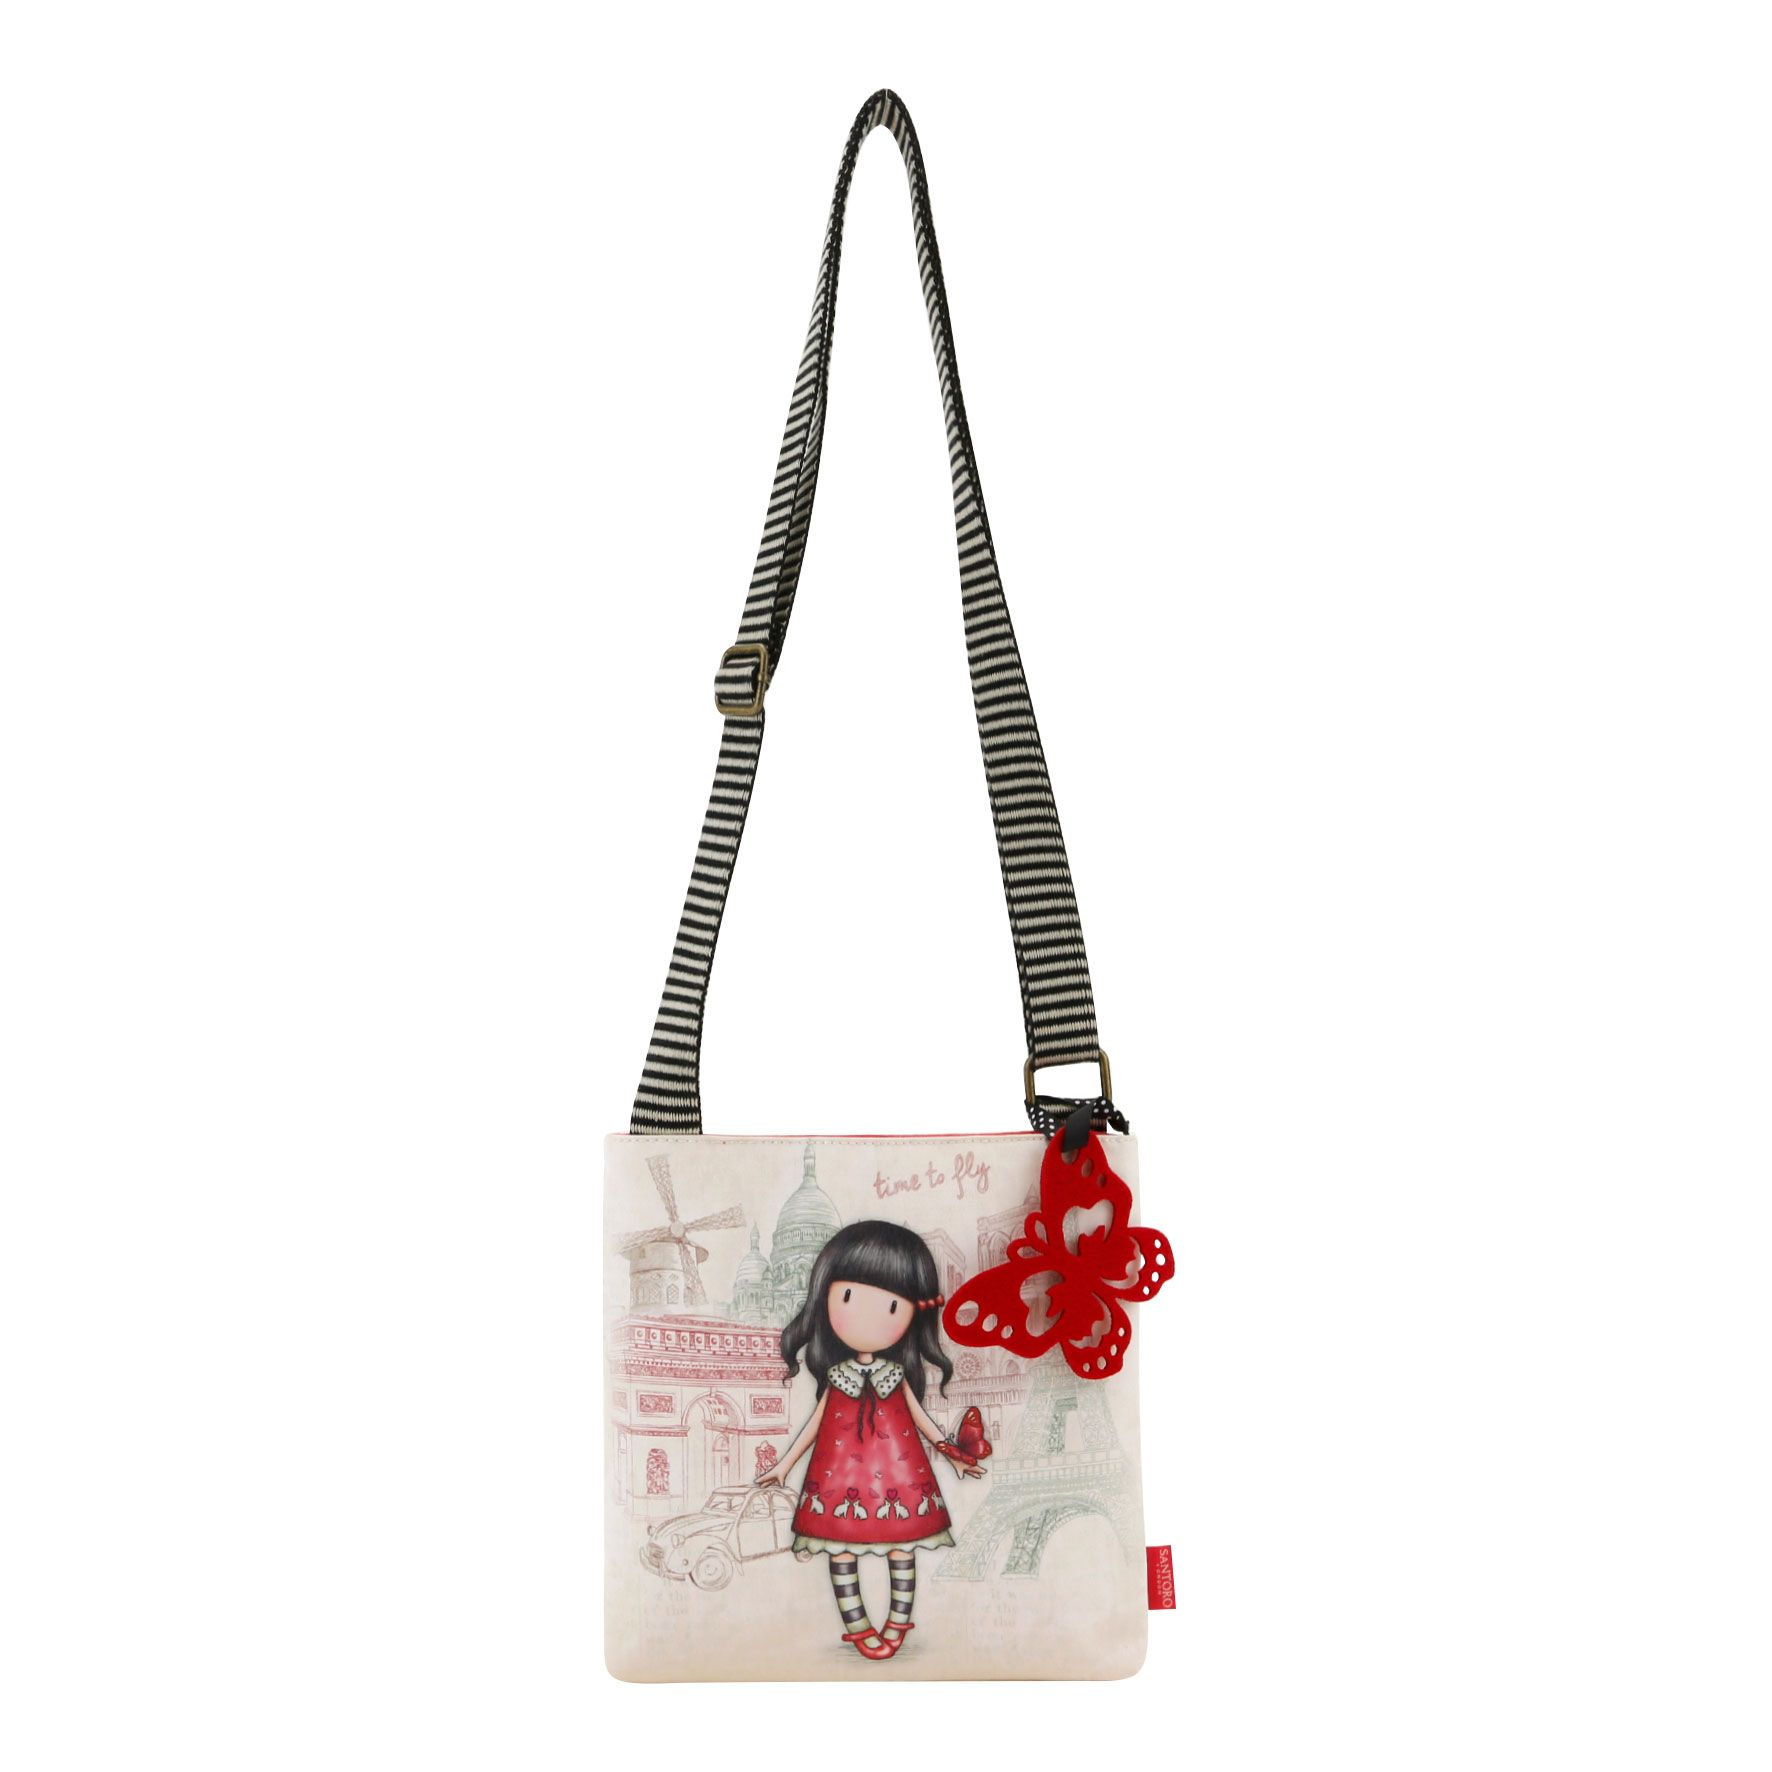 Malá kabelka přes rameno - Time To Fly od firmy SANTORO Gorjuss ... 094d9bb5552